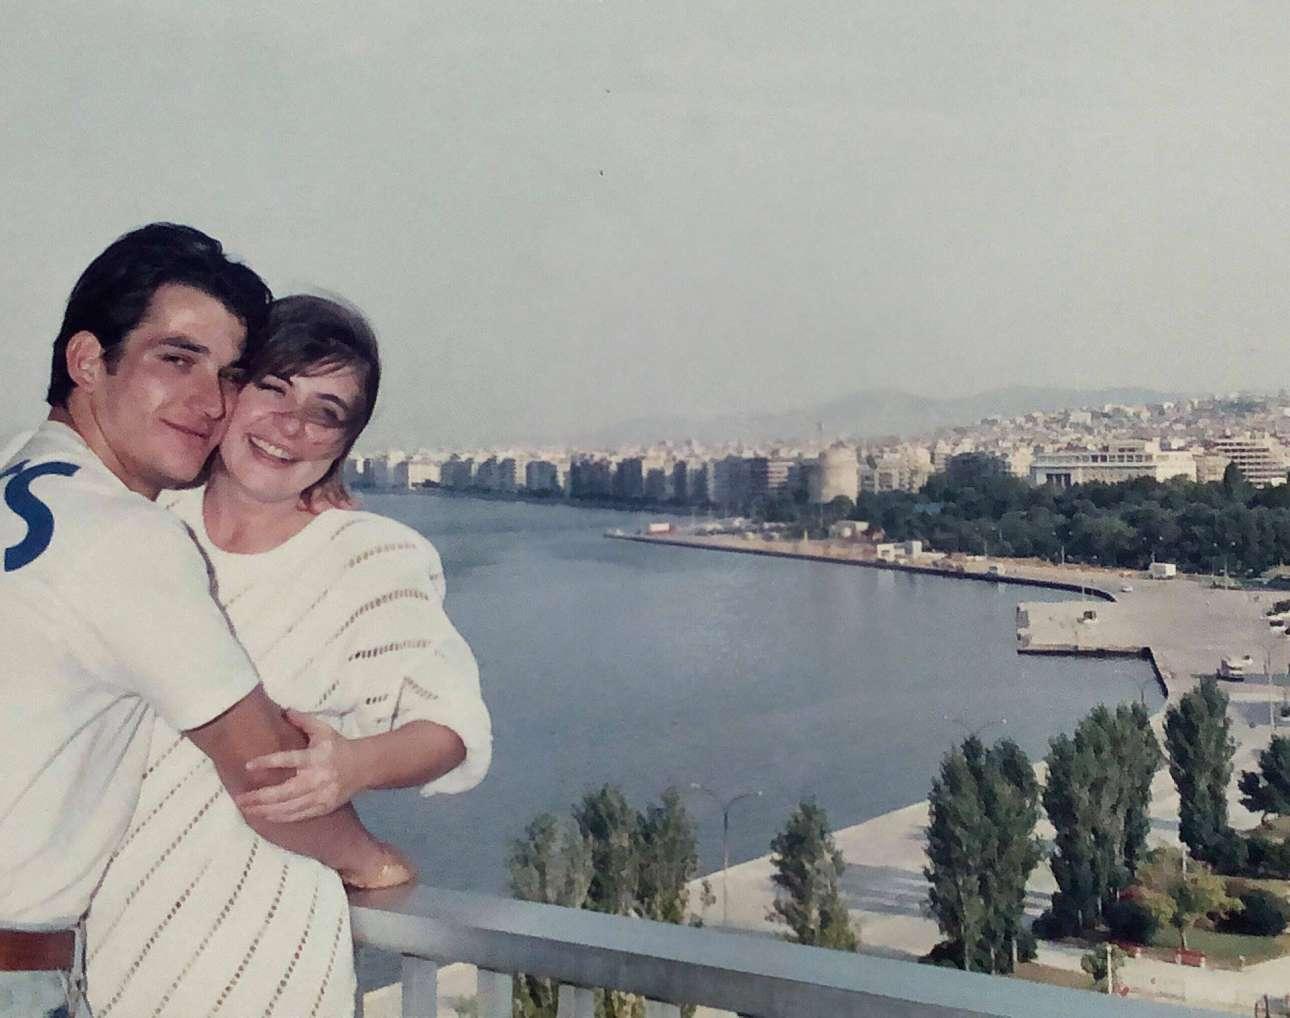 Dating Αμερικάνων στο ΗΒ δωρεάν site γνωριμιών Οττάβα